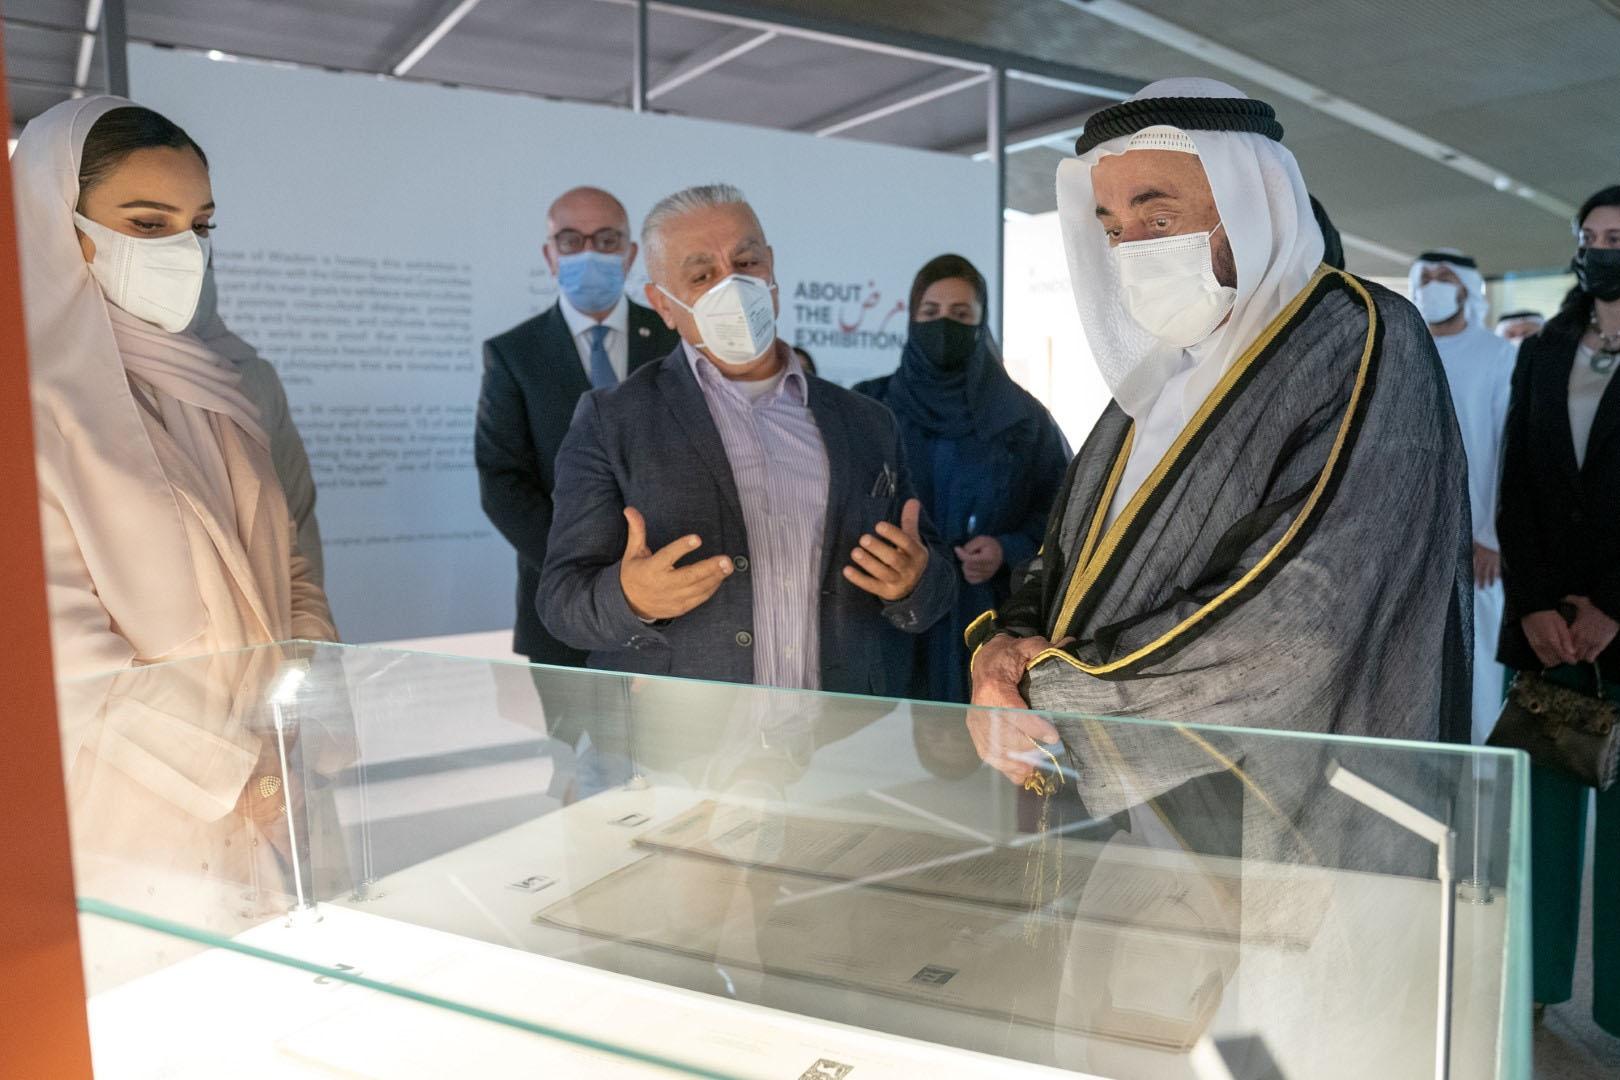 Sharjah Ruler Inagurates Exhibition for Khalil Gibran